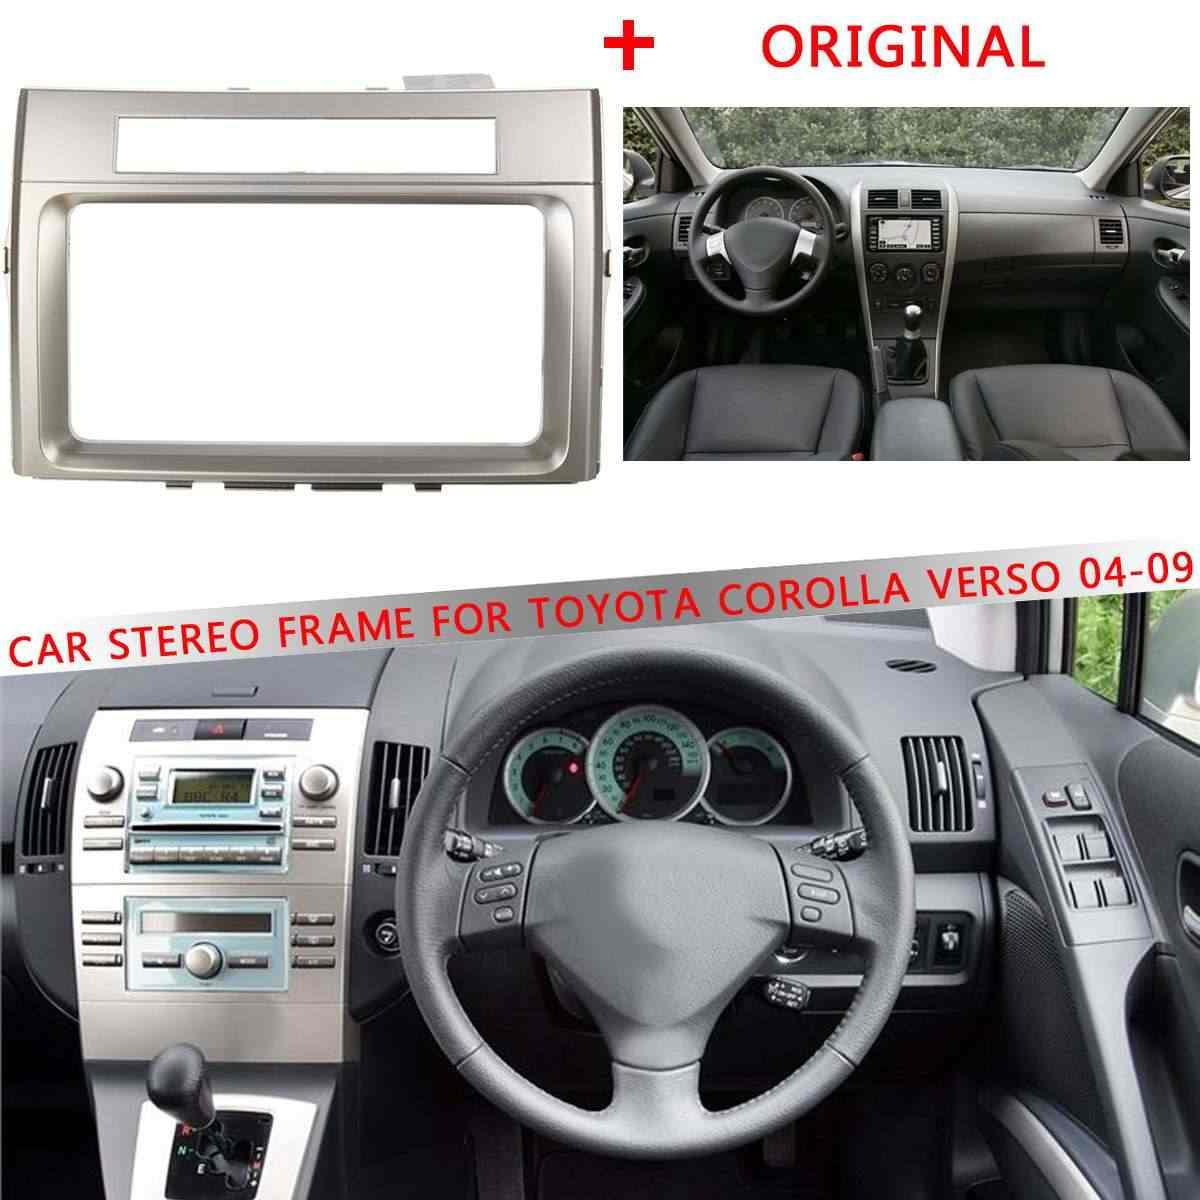 1PCS רכב CD/DVD סטריאו מסגרת Fascias לקצץ 2 דין רכב עבור טויוטה קורולה Verso 2004 2005 2006 2007 2008 2009 מתאם ערכת דאש